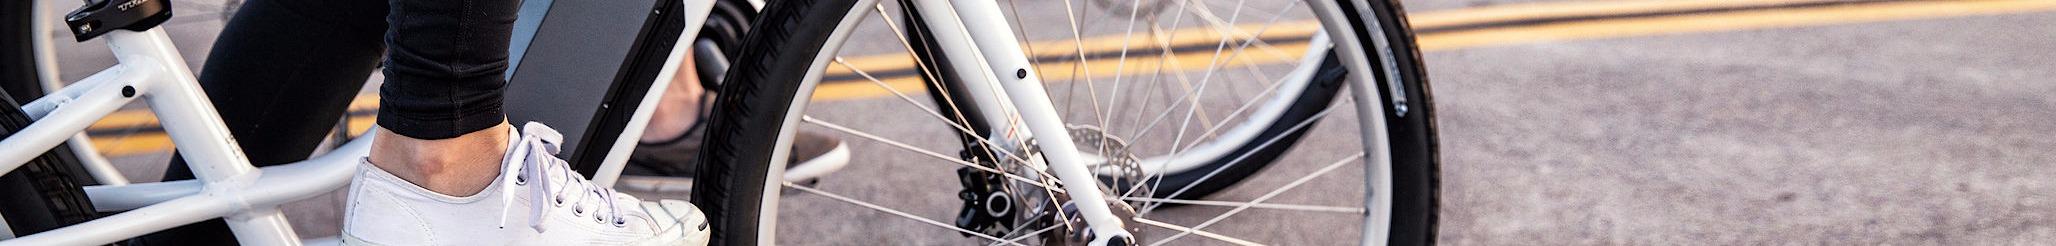 Bike Rental - Portland